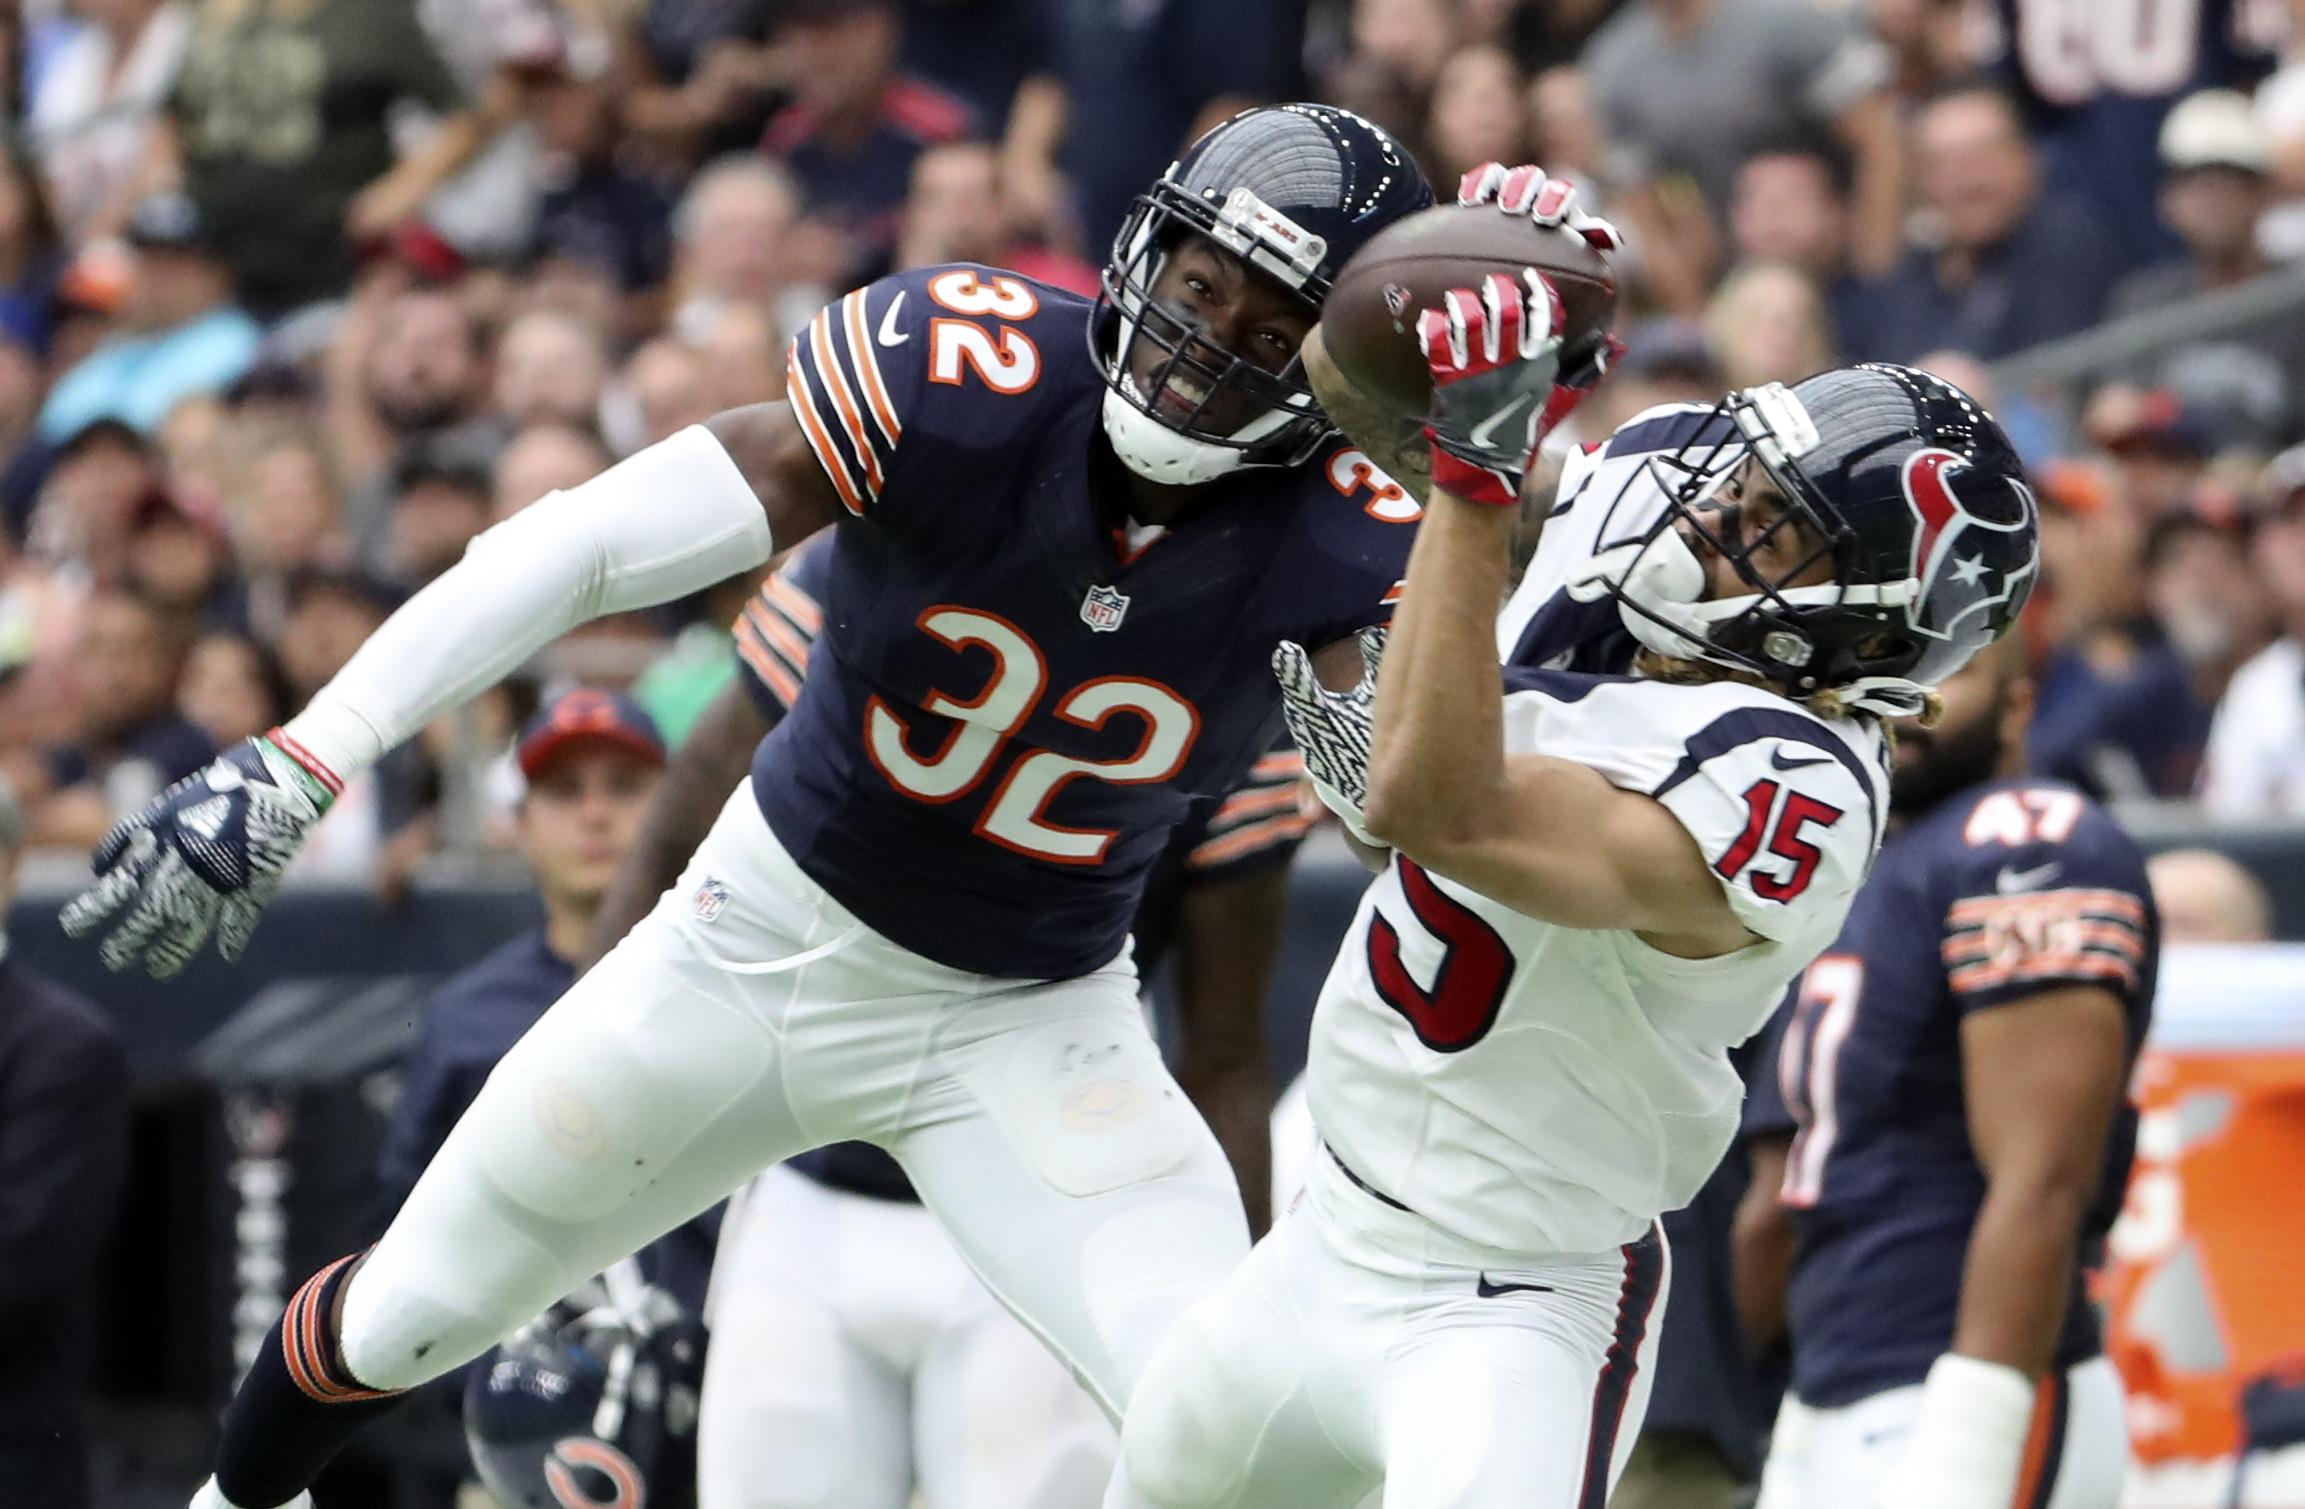 NFL: Chicago Bears at Houston Texans